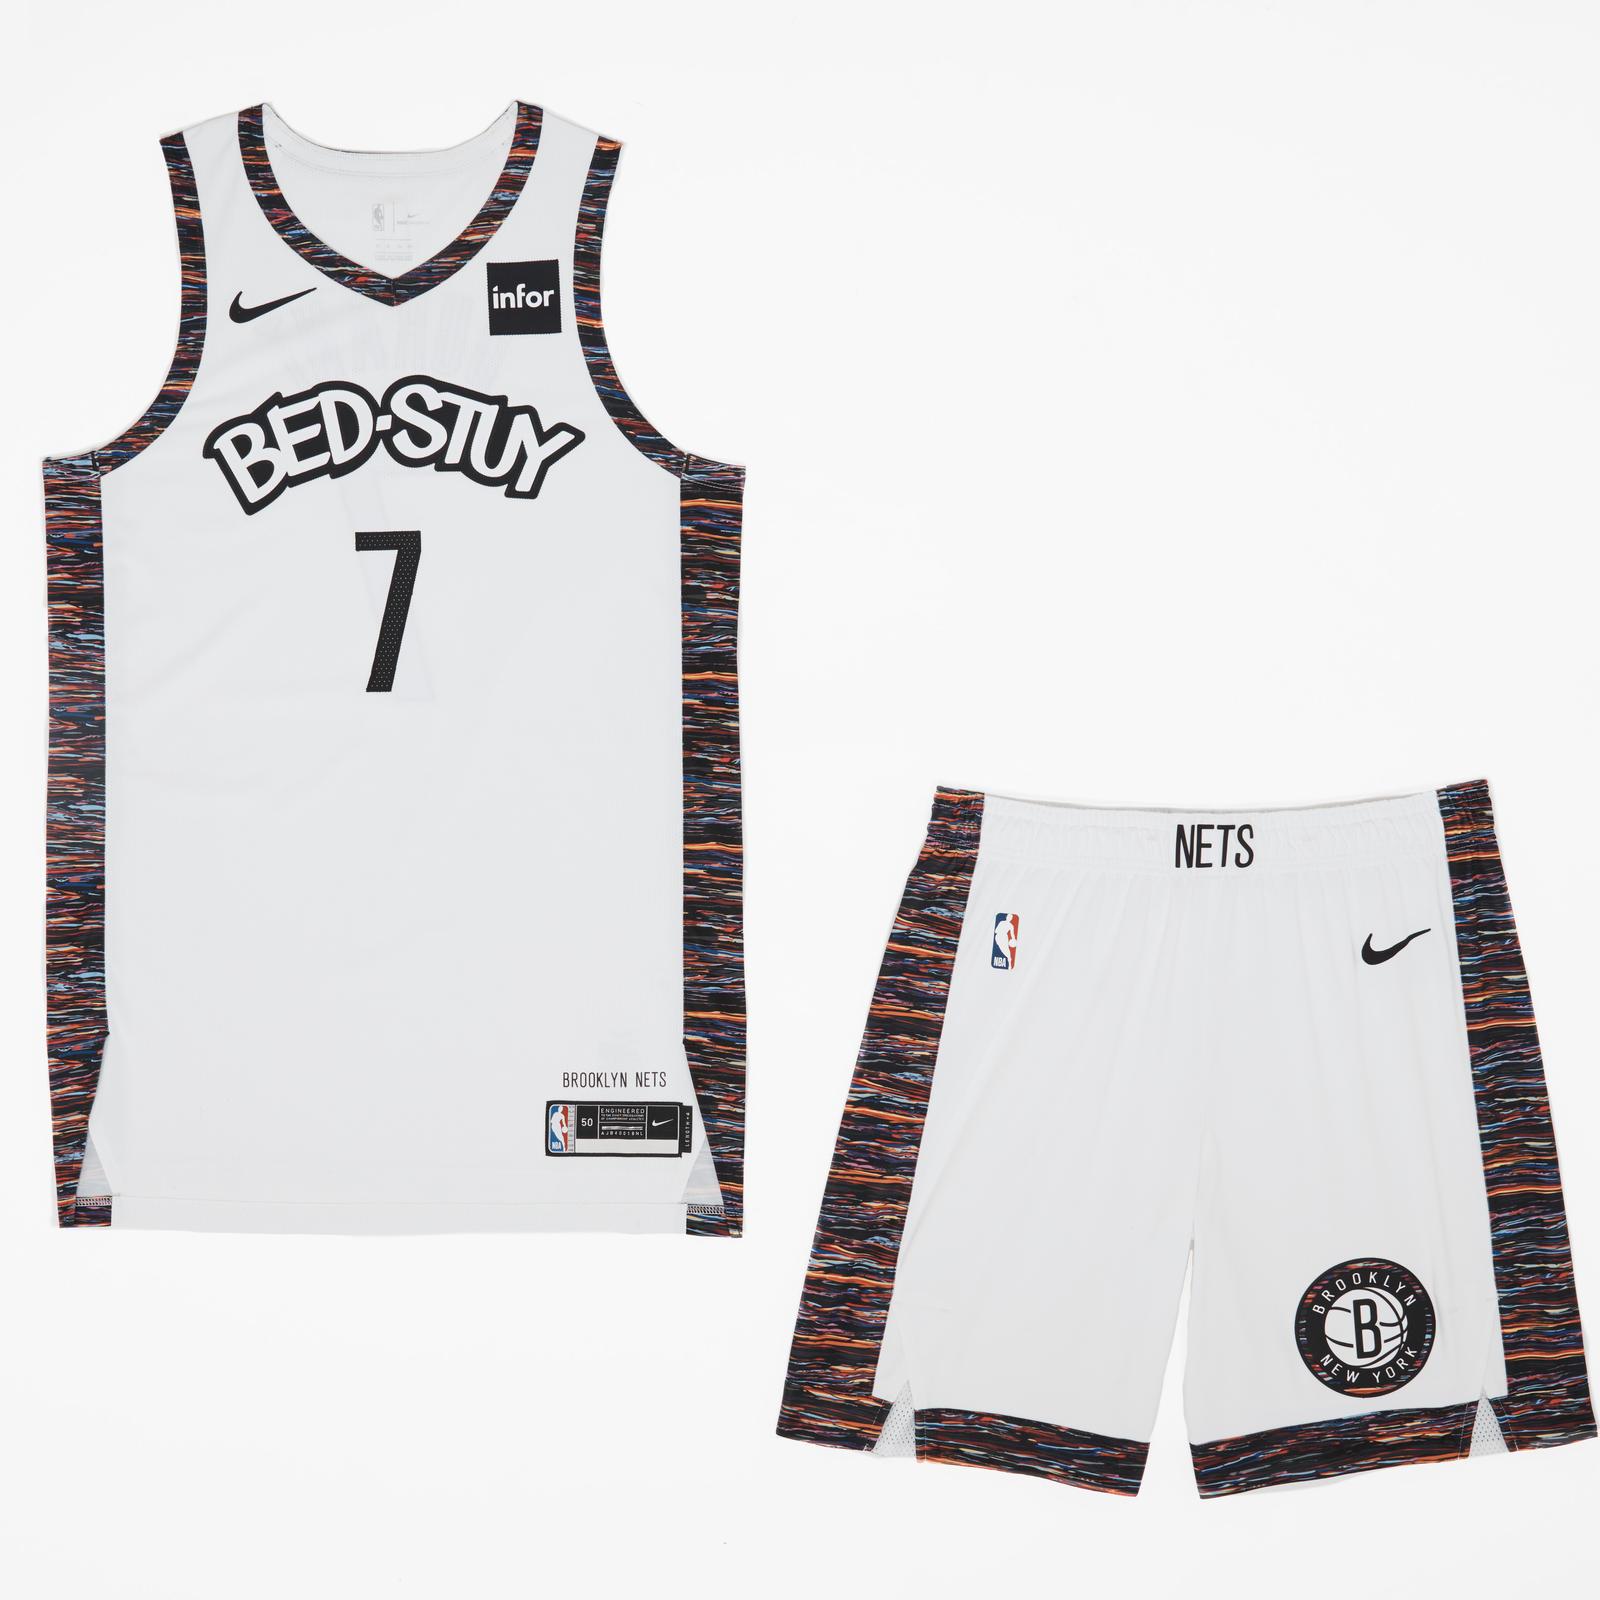 Brooklyn Nets Bed Stuy City Edition